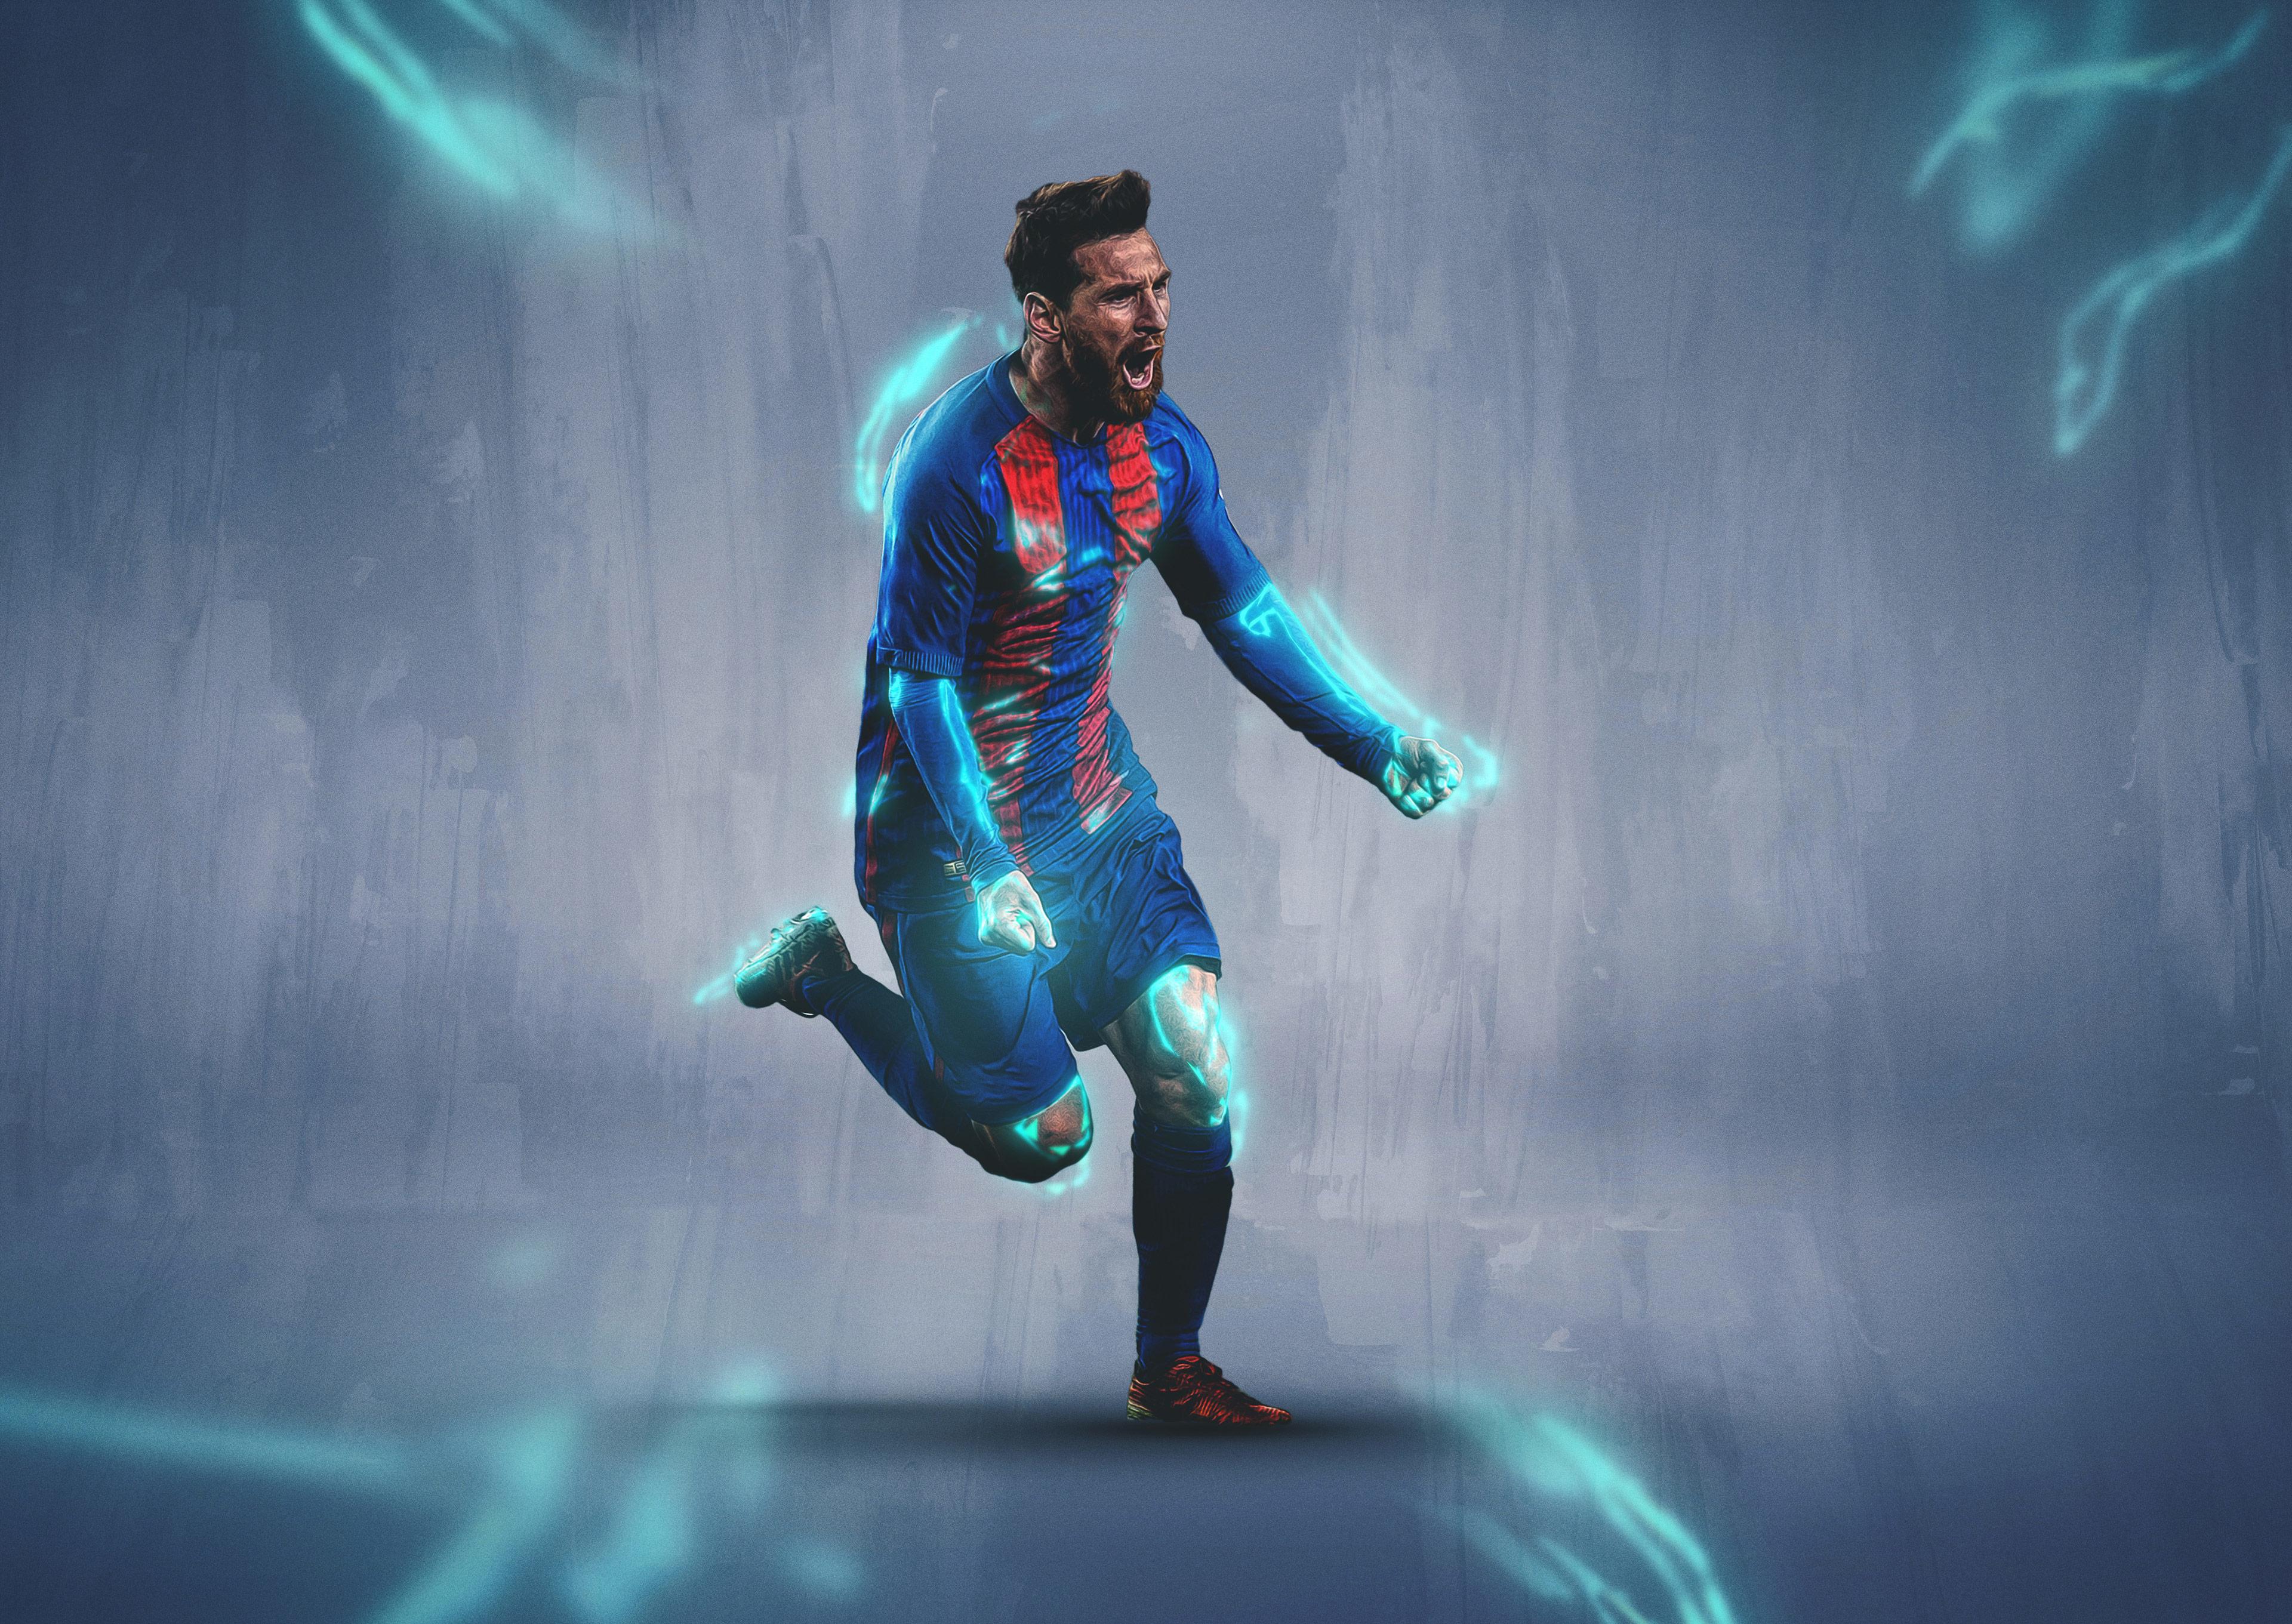 Lionel Messi 2019 Wallpaper, HD Sports 4K Wallpapers ...